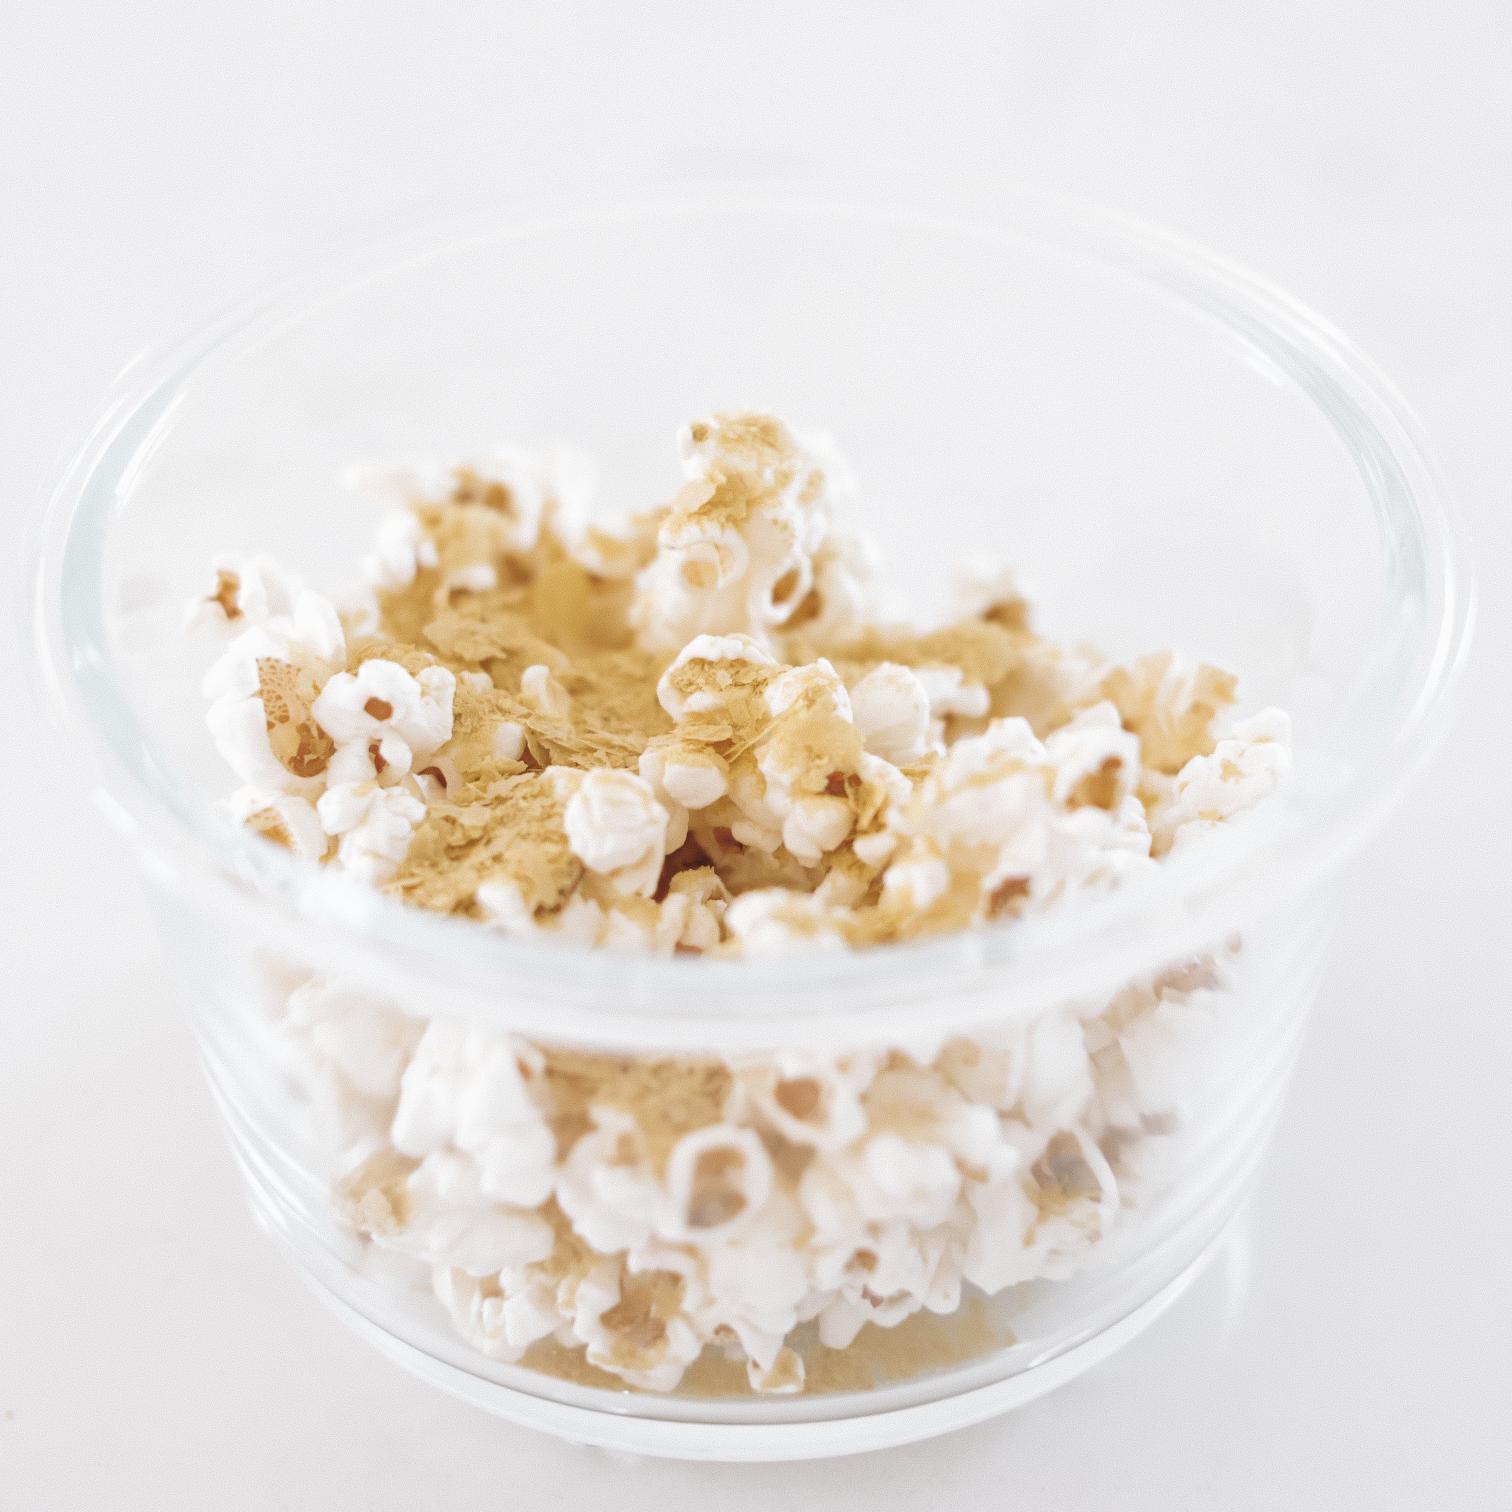 Cheesy Popcorn - 179kcal12g P / 8g F / 13g C